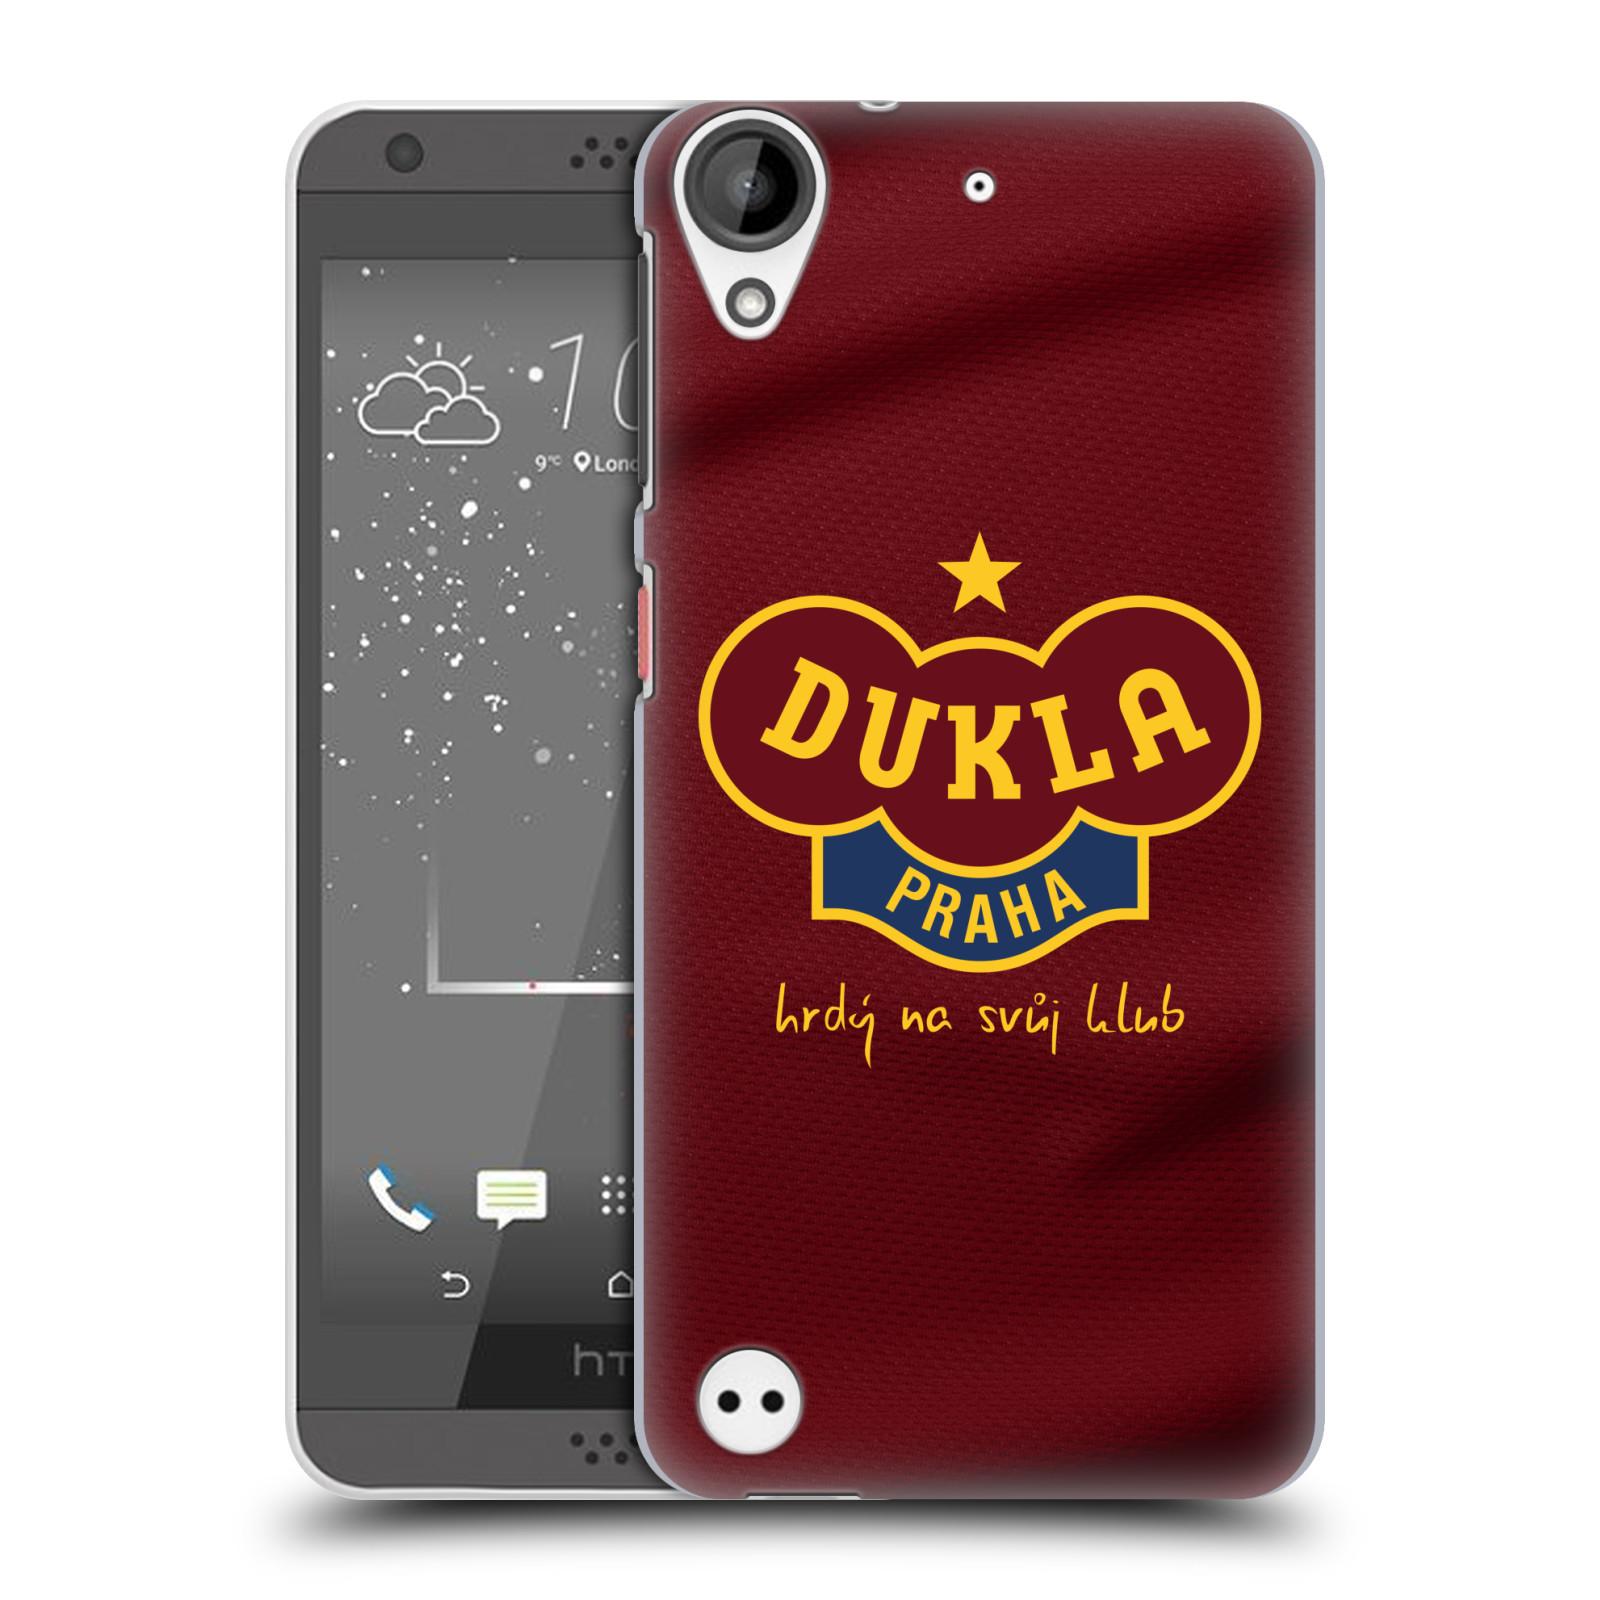 Plastové pouzdro na mobil HTC Desire 530 - FK Dukla Praha - Vínově červený dres